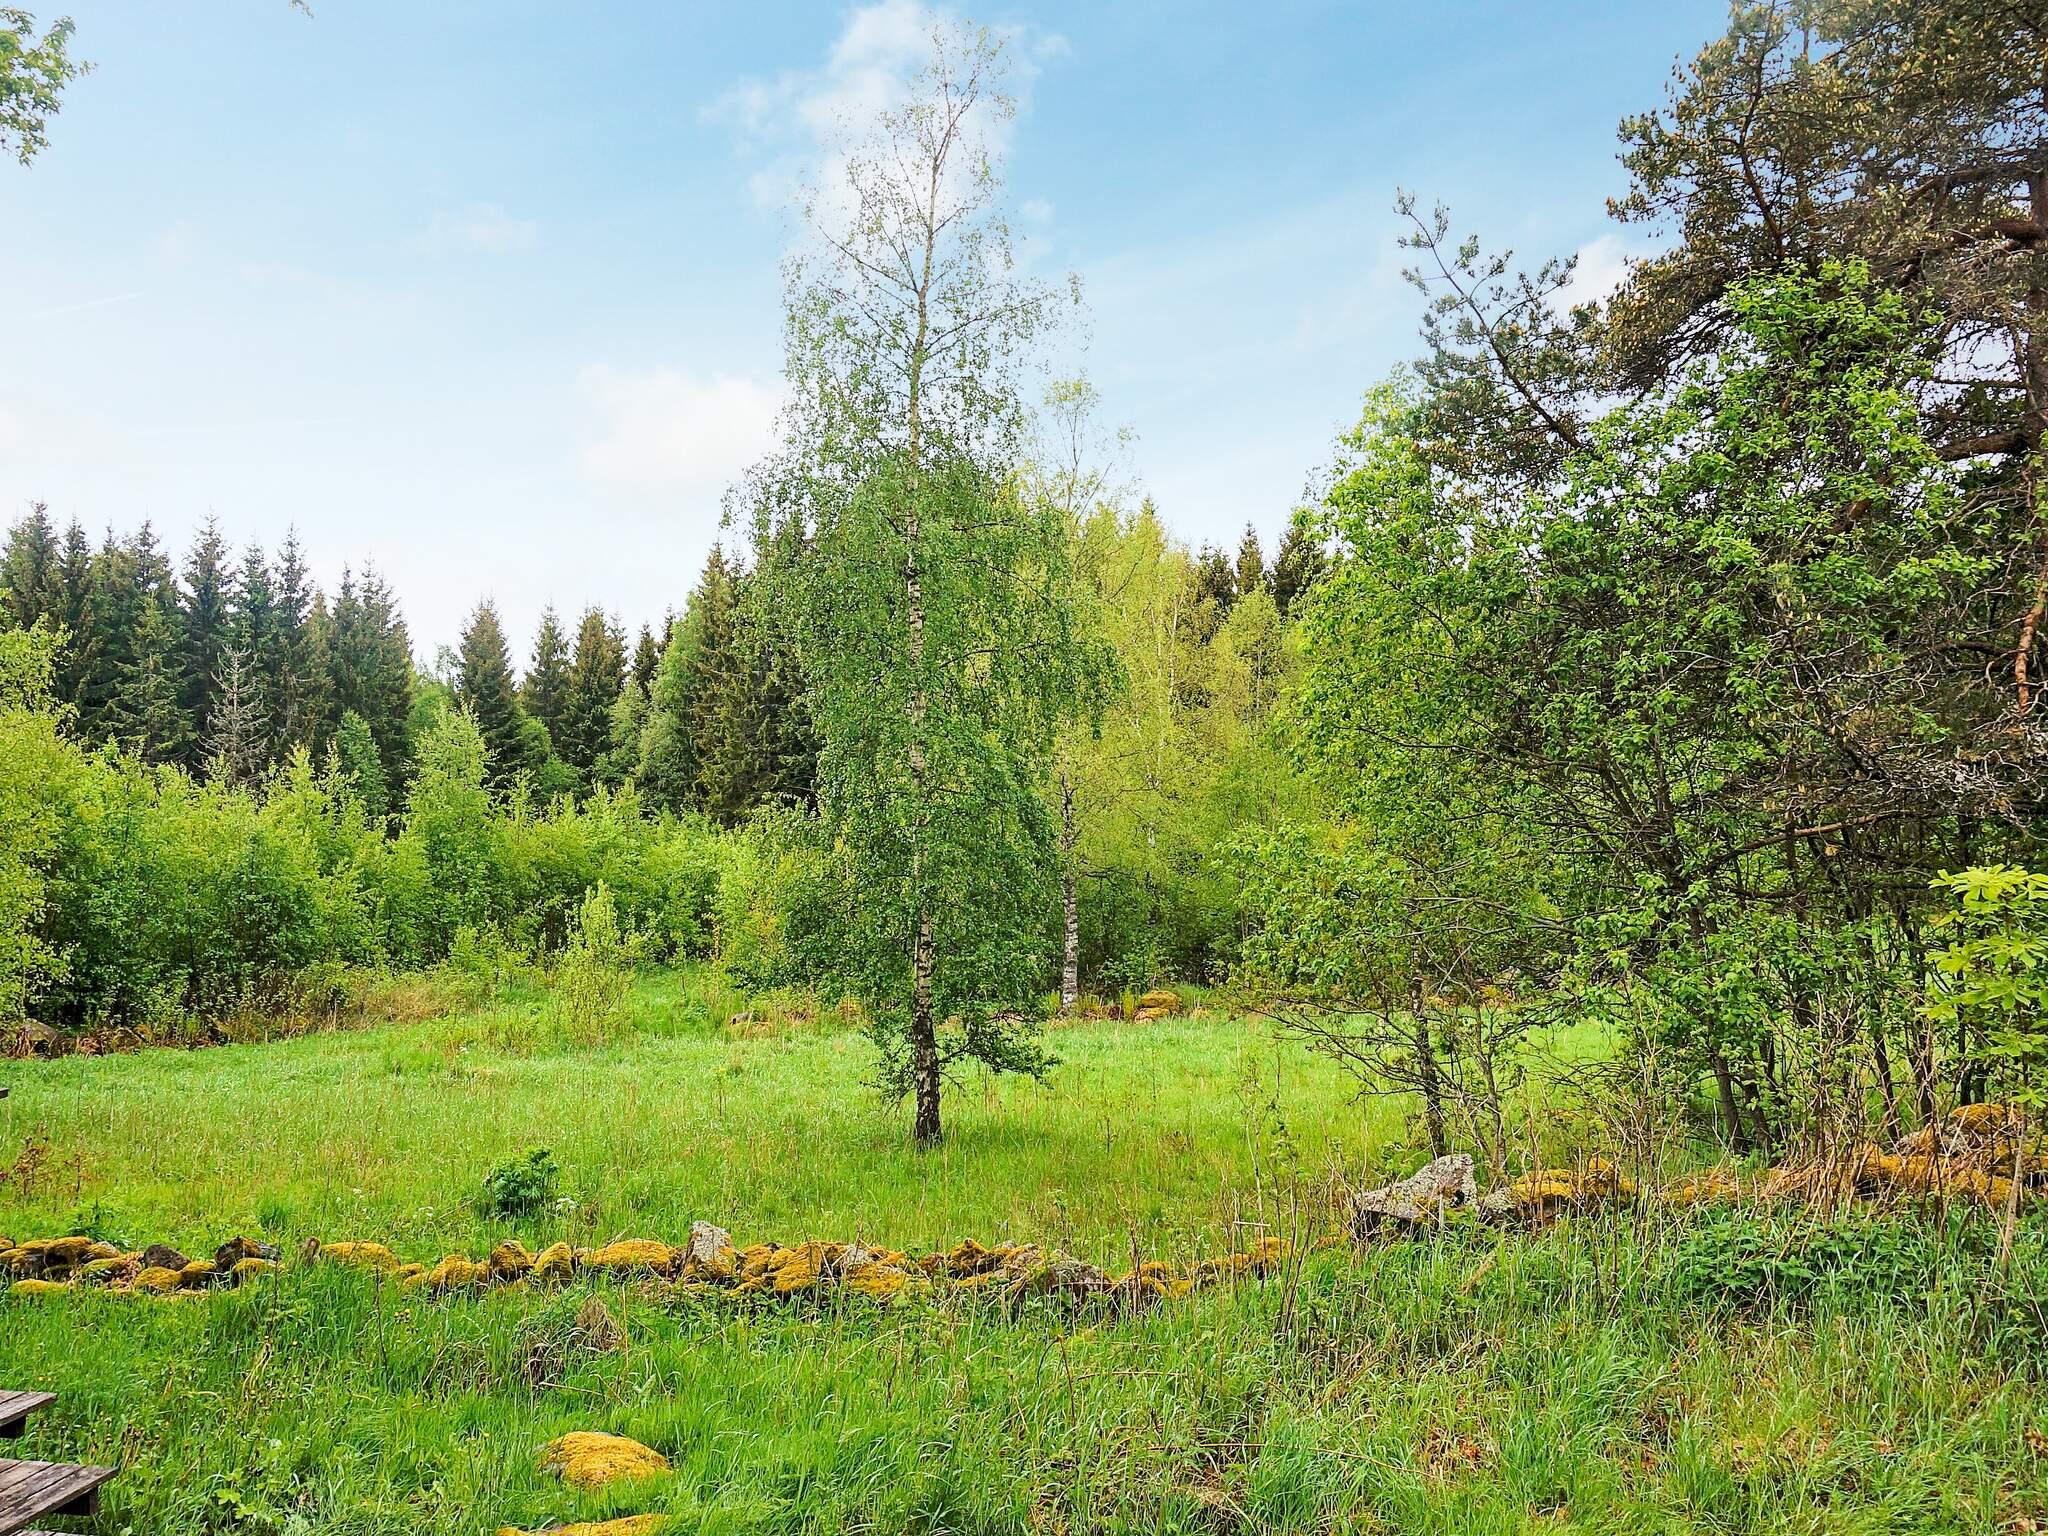 Ferienhaus Falköping (2636837), Trädet, Västra Götaland län, Westschweden, Schweden, Bild 27